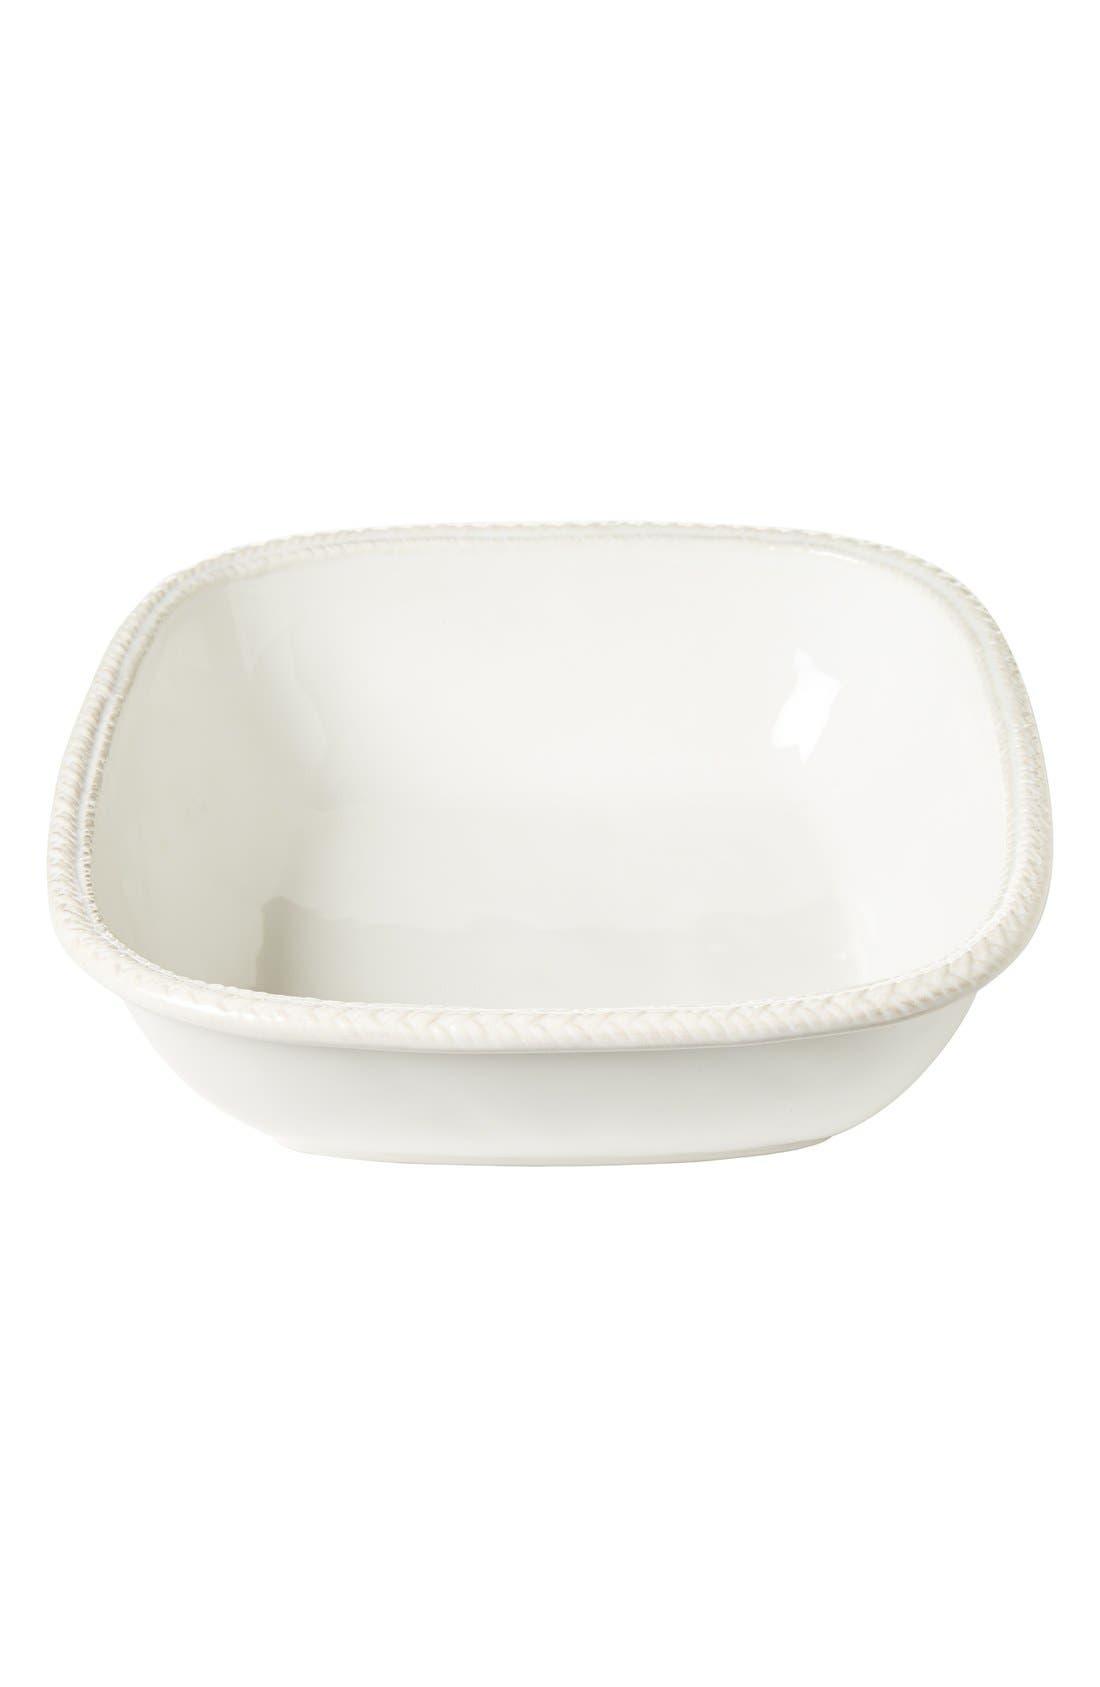 Le Panier Medium Ceramic Serving Bowl,                             Main thumbnail 1, color,                             White